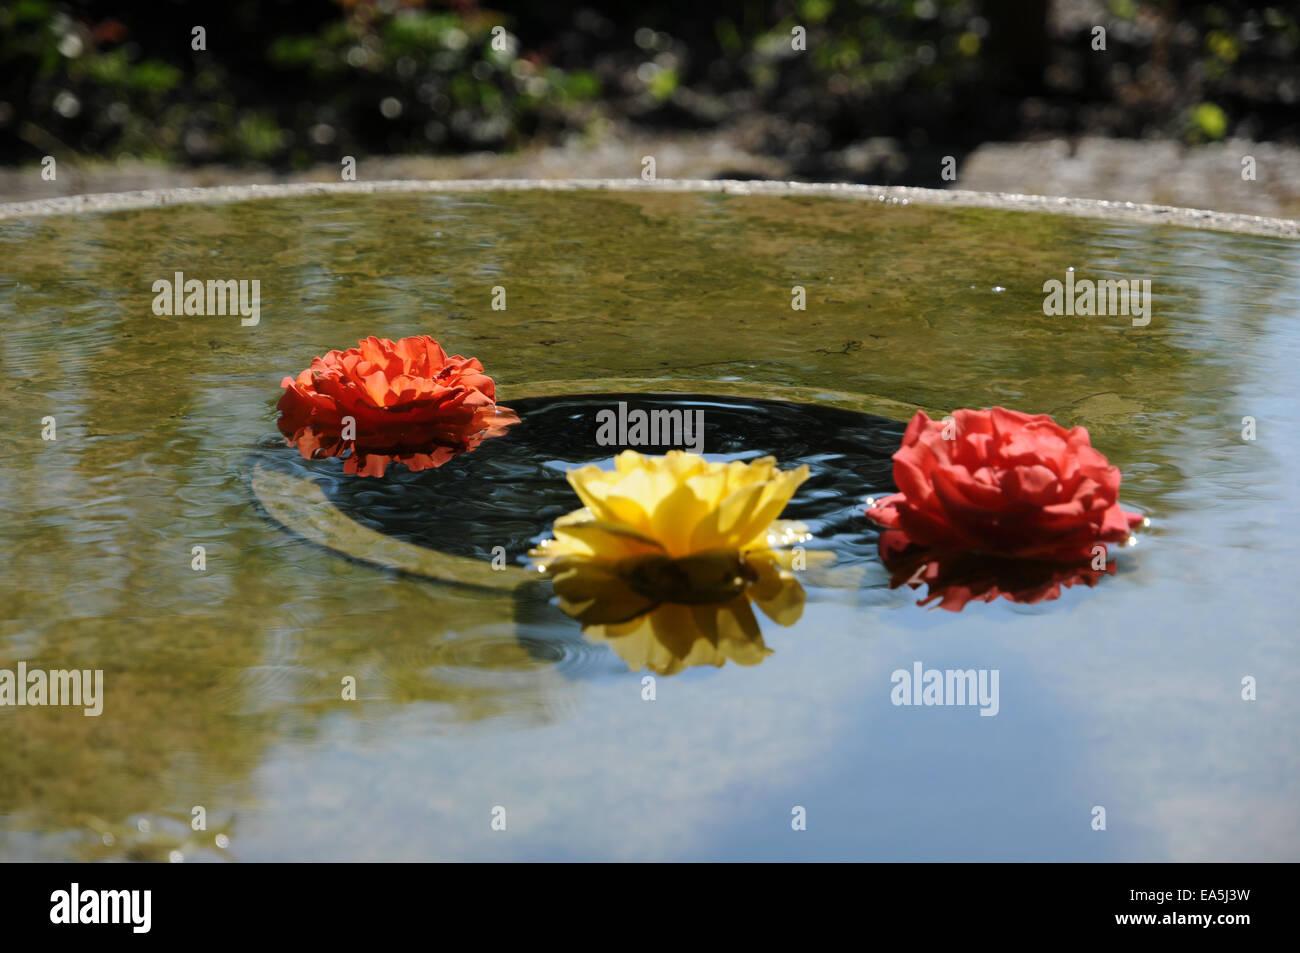 Wasser gut mit Rosen Stockbild